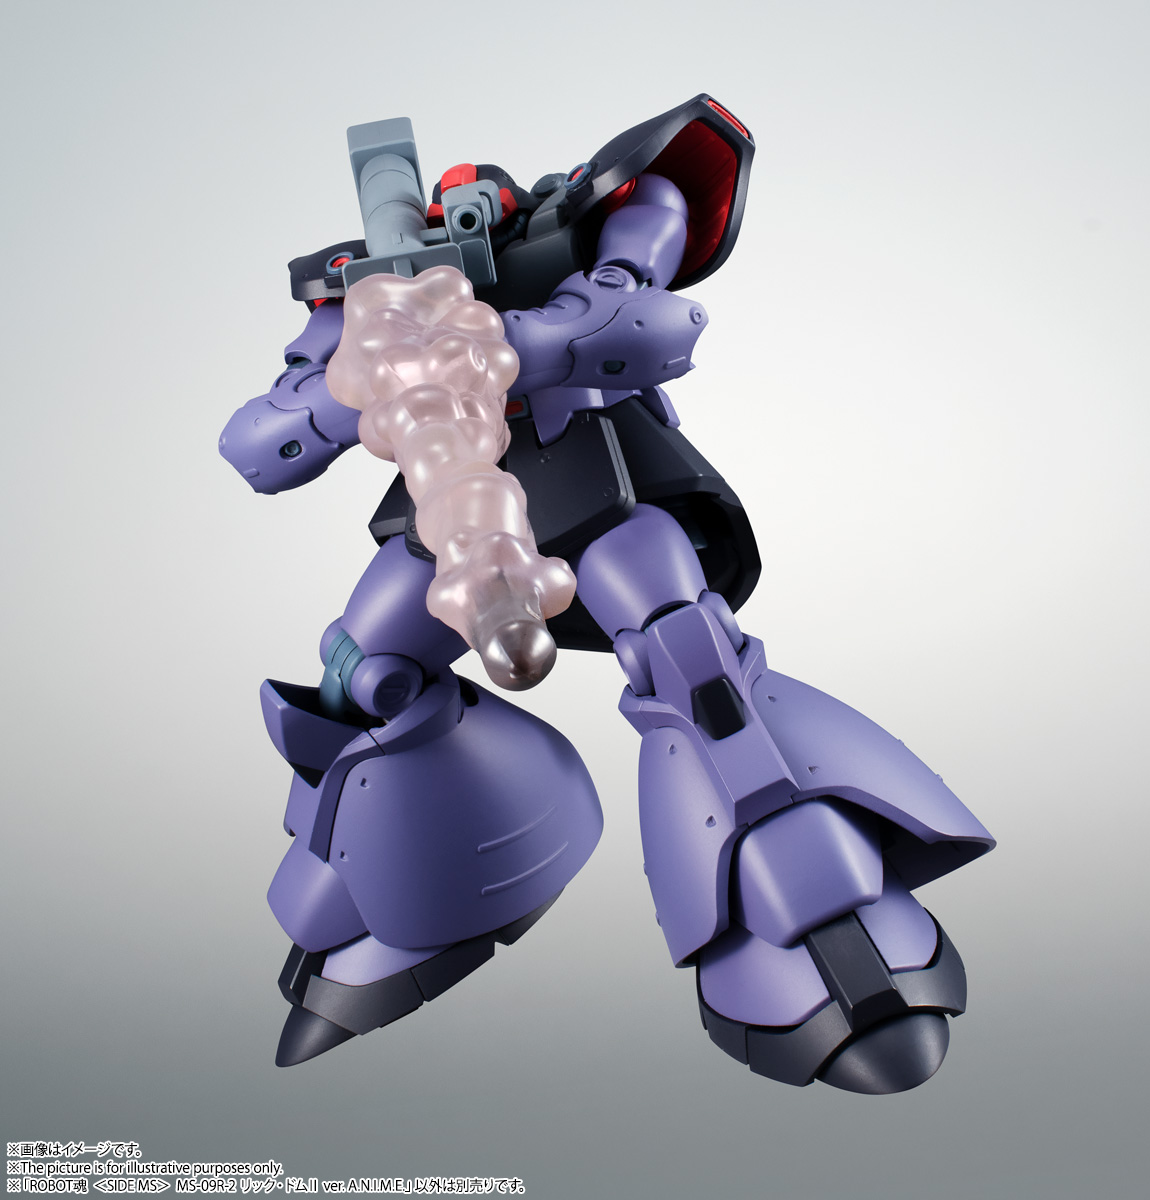 ROBOT魂〈SIDE MS〉『MS-09R-2 リック・ドムⅡ ver. A.N.I.M.E.』機動戦士ガンダム0083 可動フィギュア-012